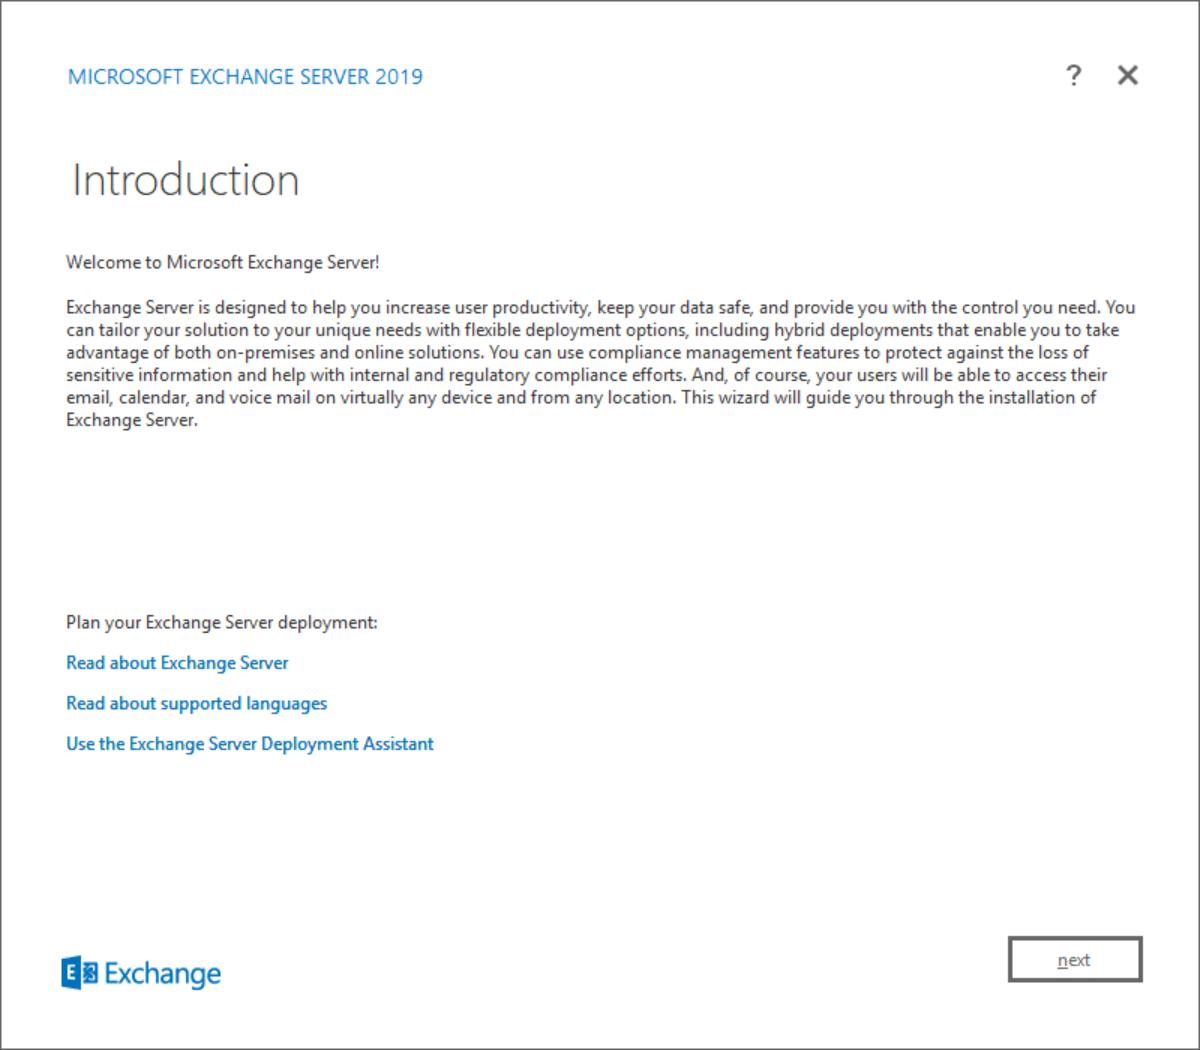 Exchange server 2010 product key free | Exchange Server 2010 product